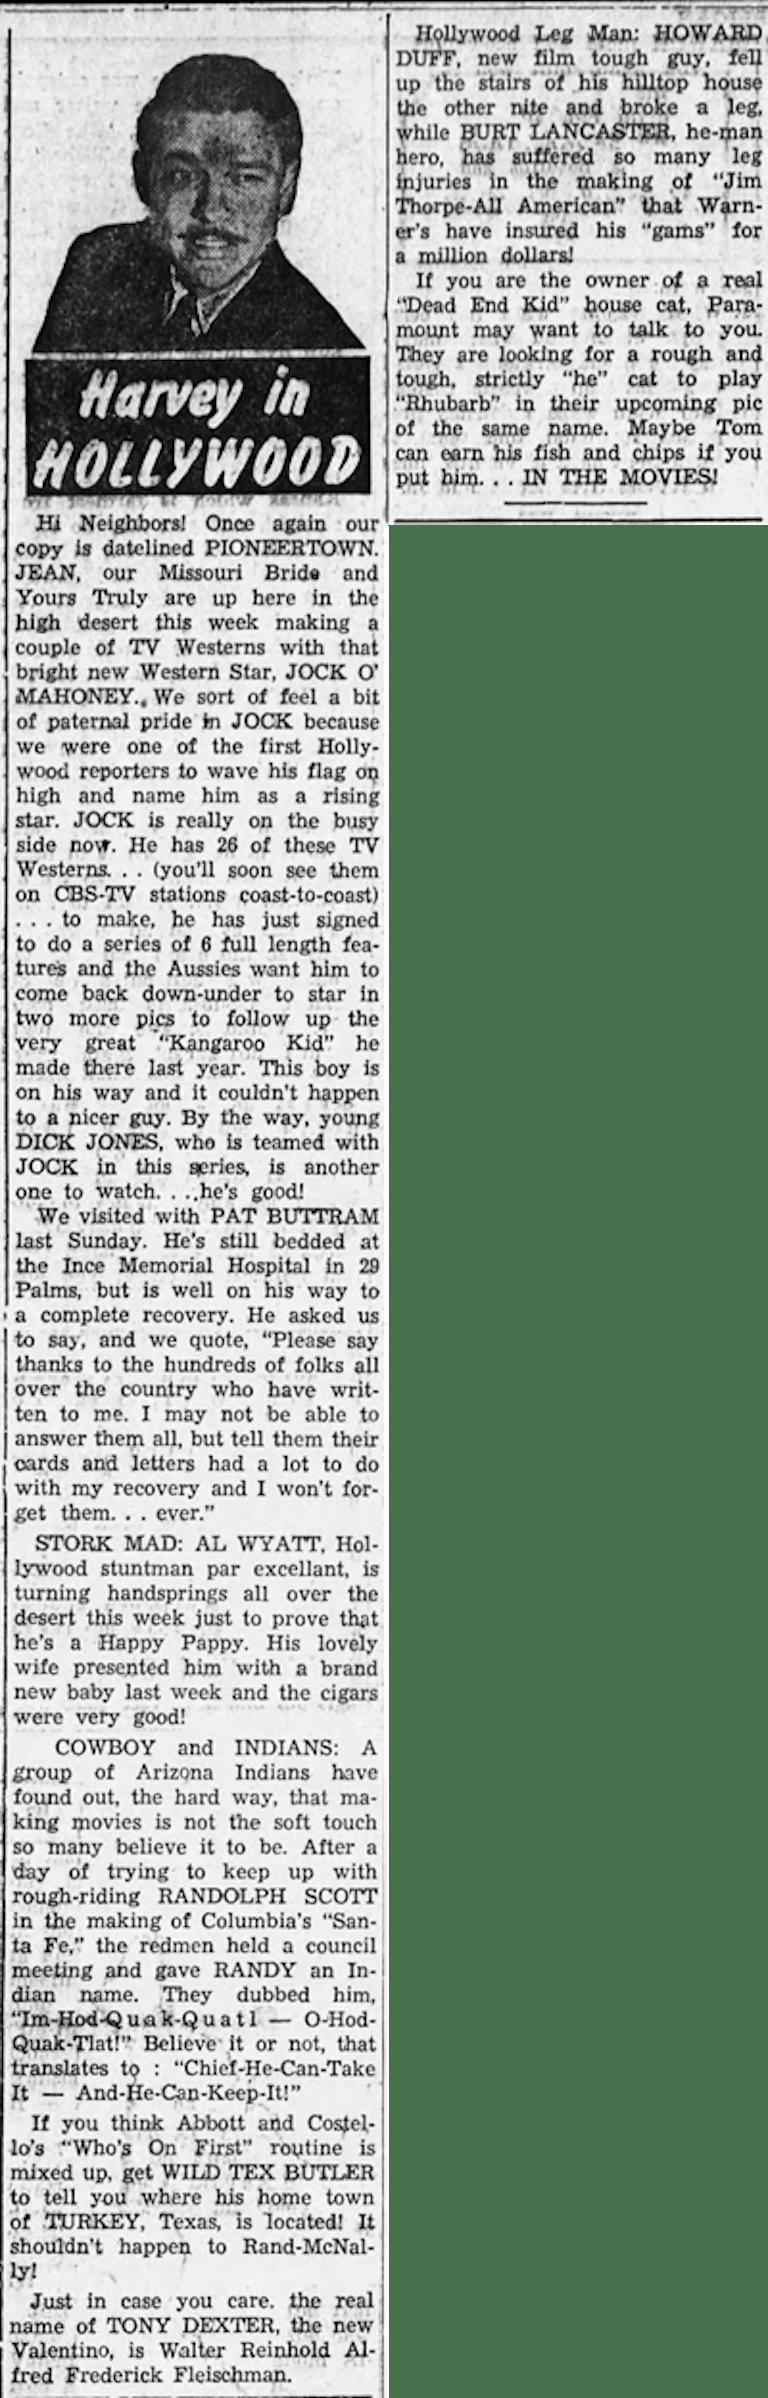 Harvey in Hollywood Nov. 9, 1950